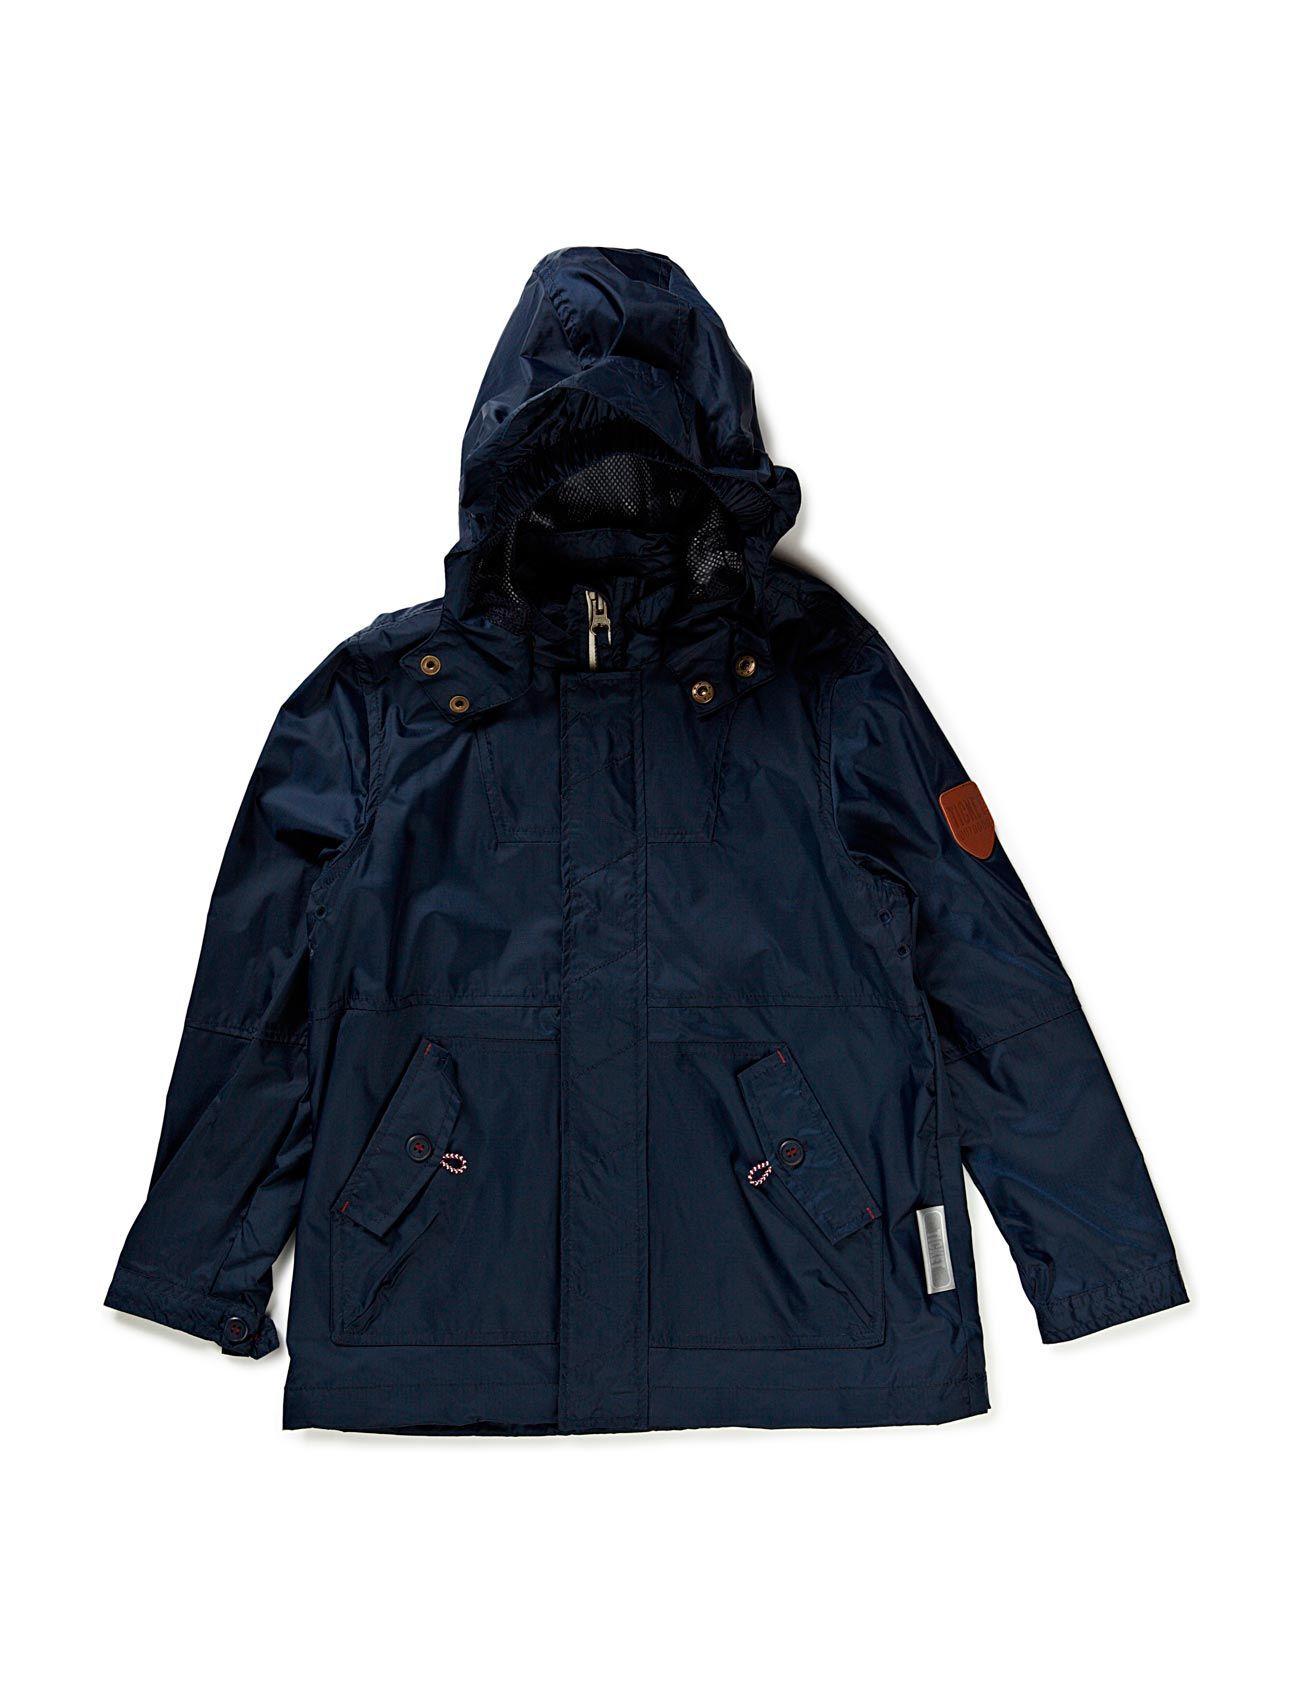 Nassau Jacket